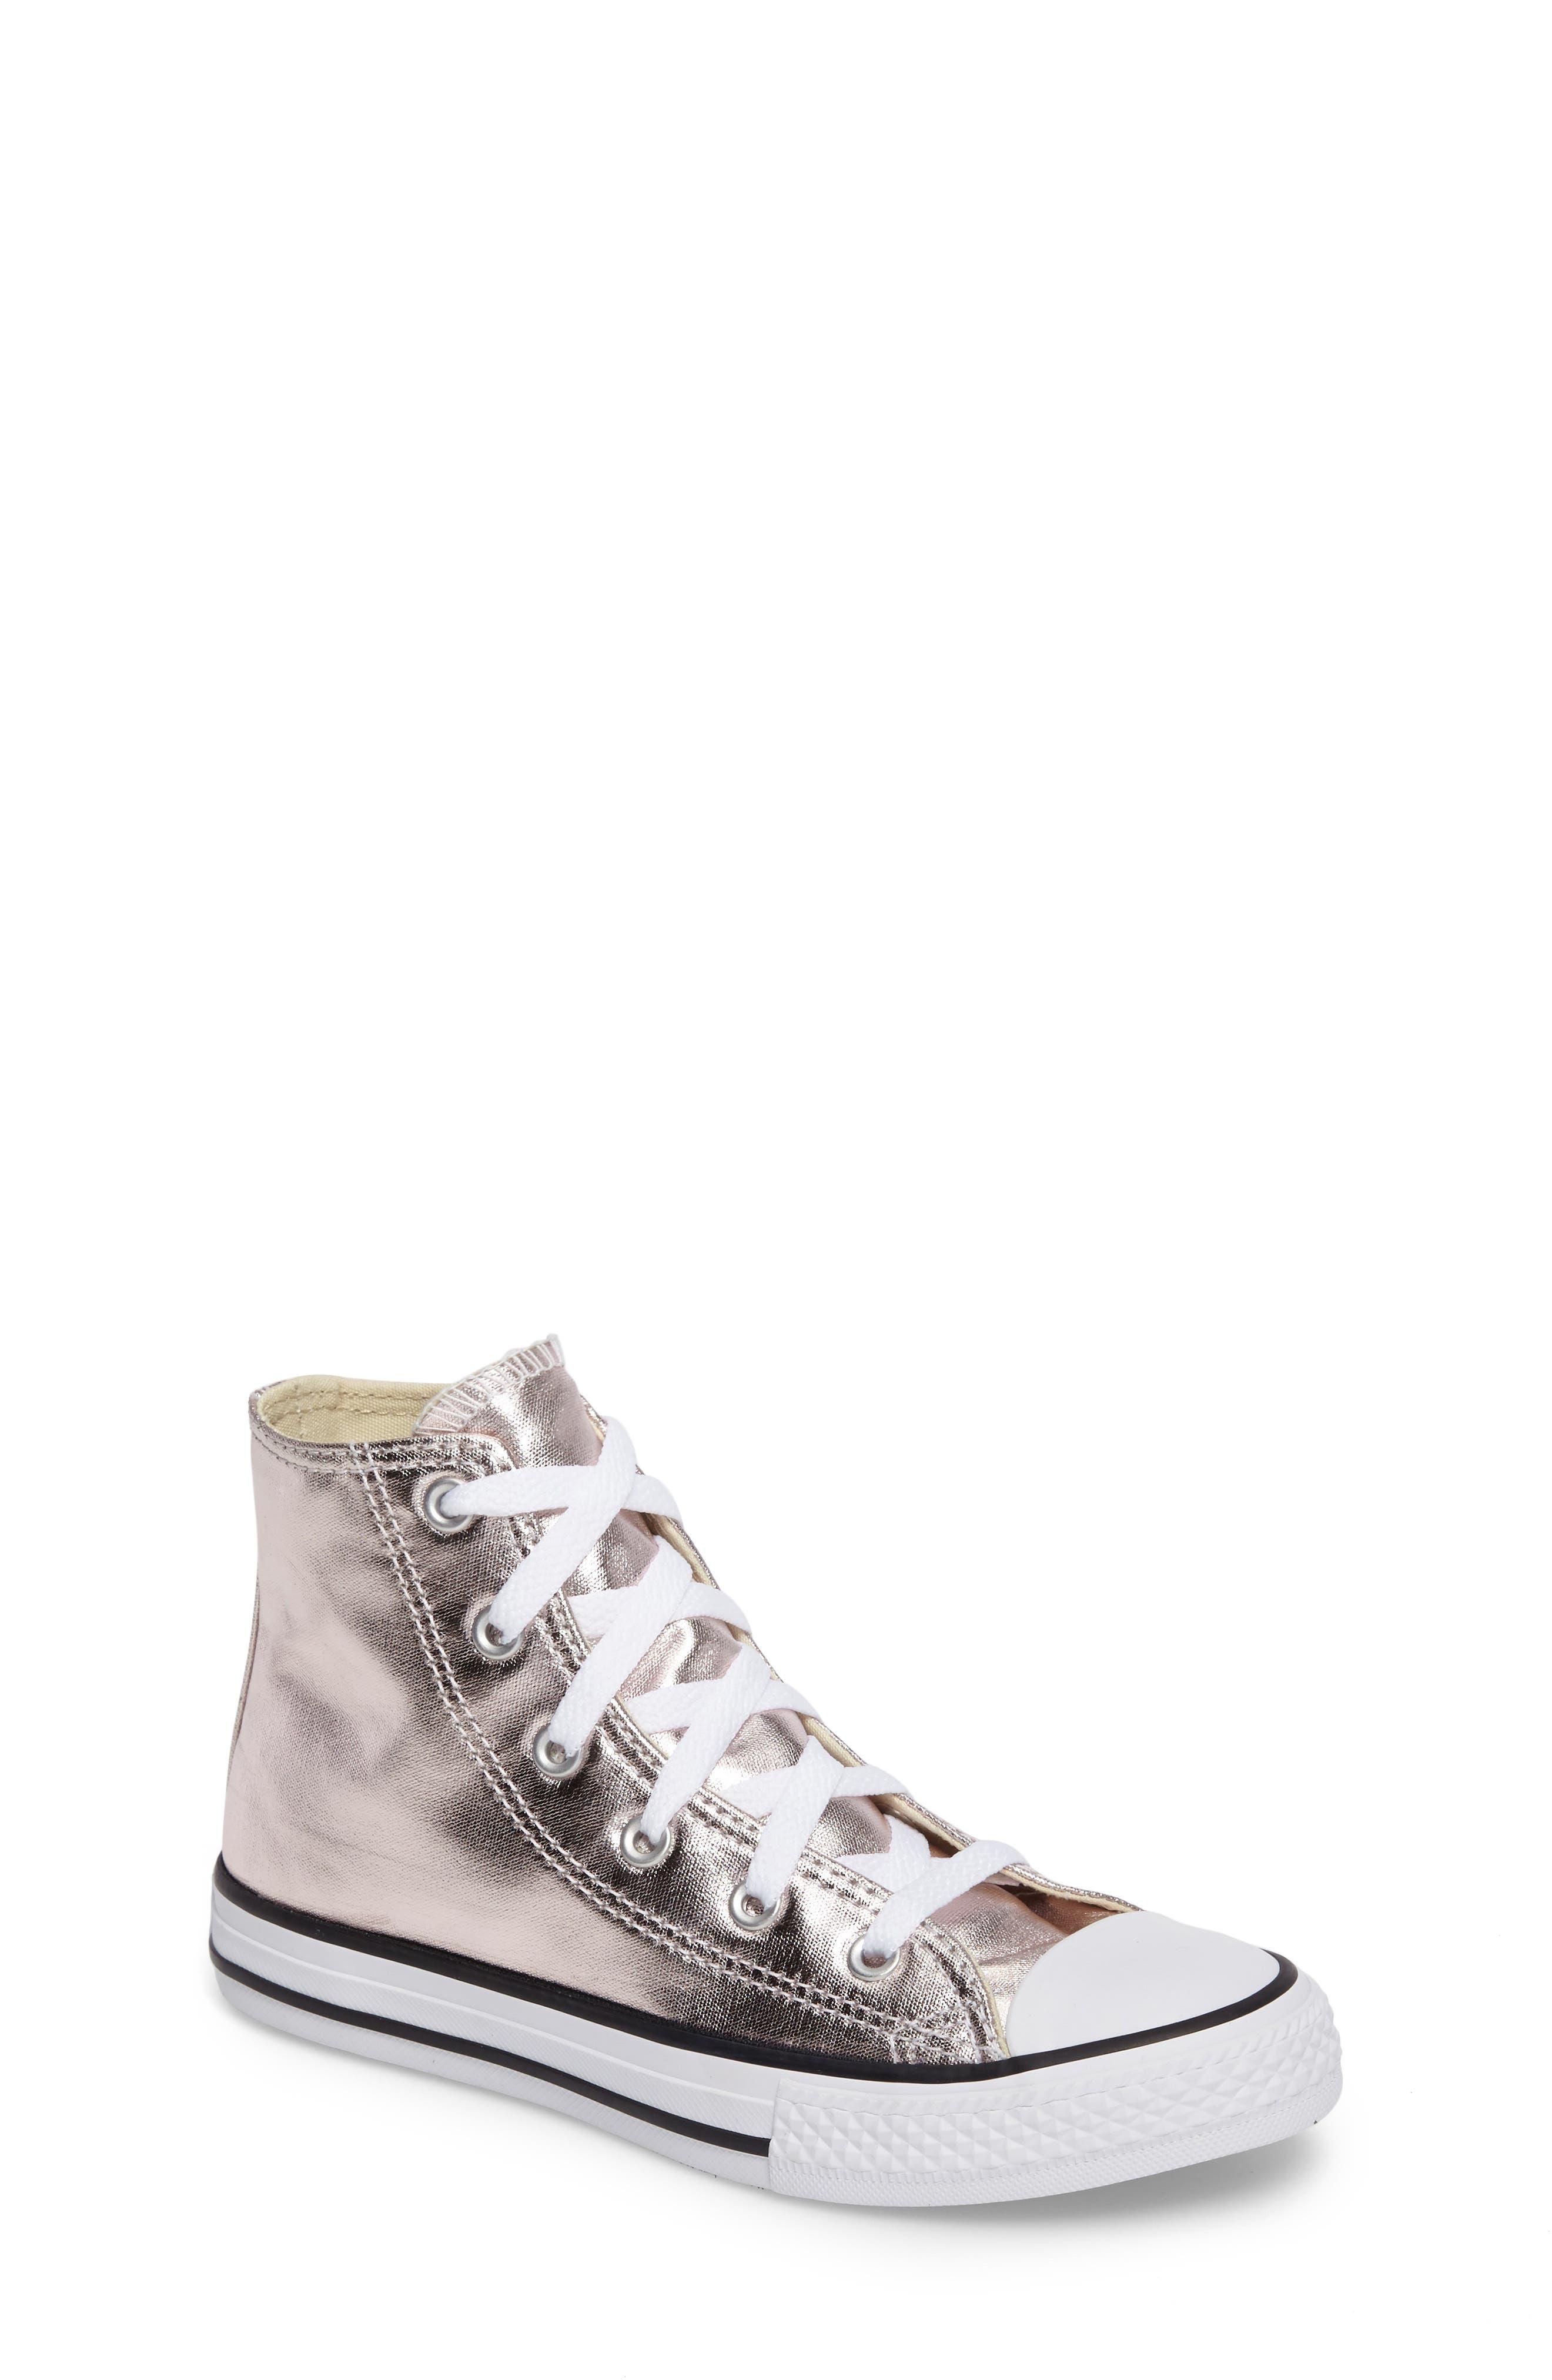 Main Image - Converse Chuck Taylor® All Star® Seasonal Metallic High Top Sneaker (Toddler & Little Kid)